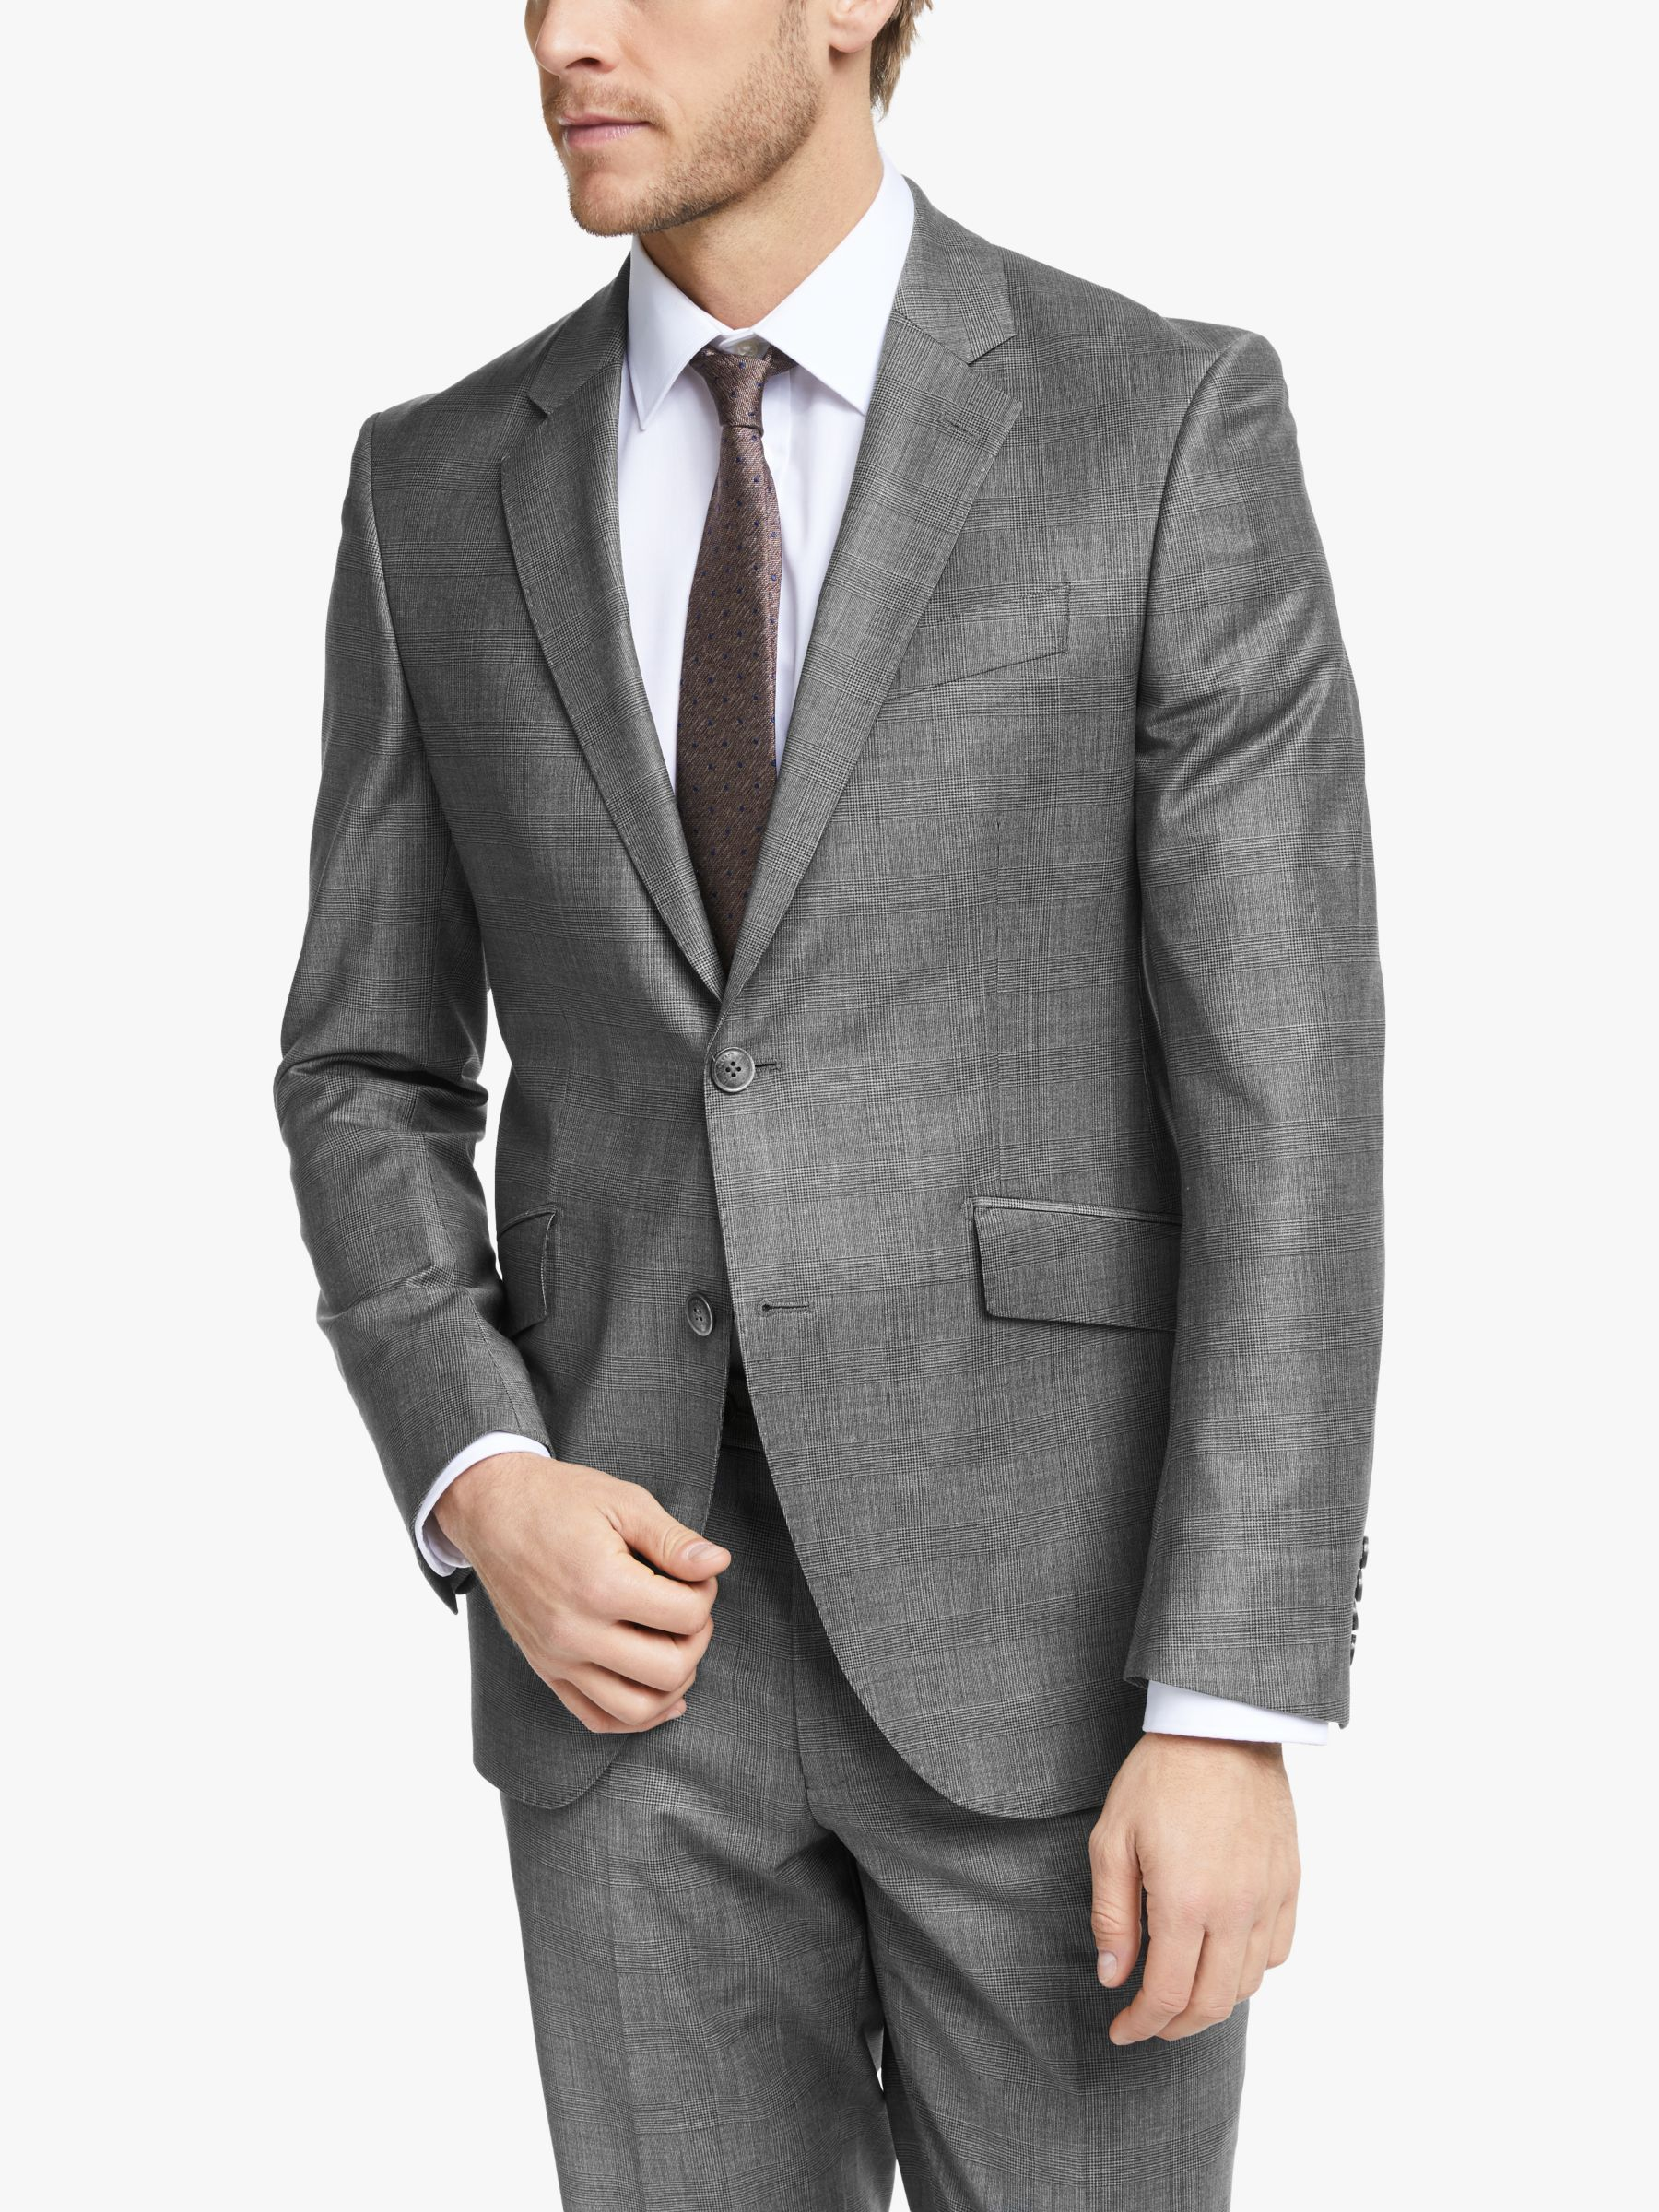 Hackett London Hackett London Prince of Wales Check Slim Fit Suit Jacket, Grey